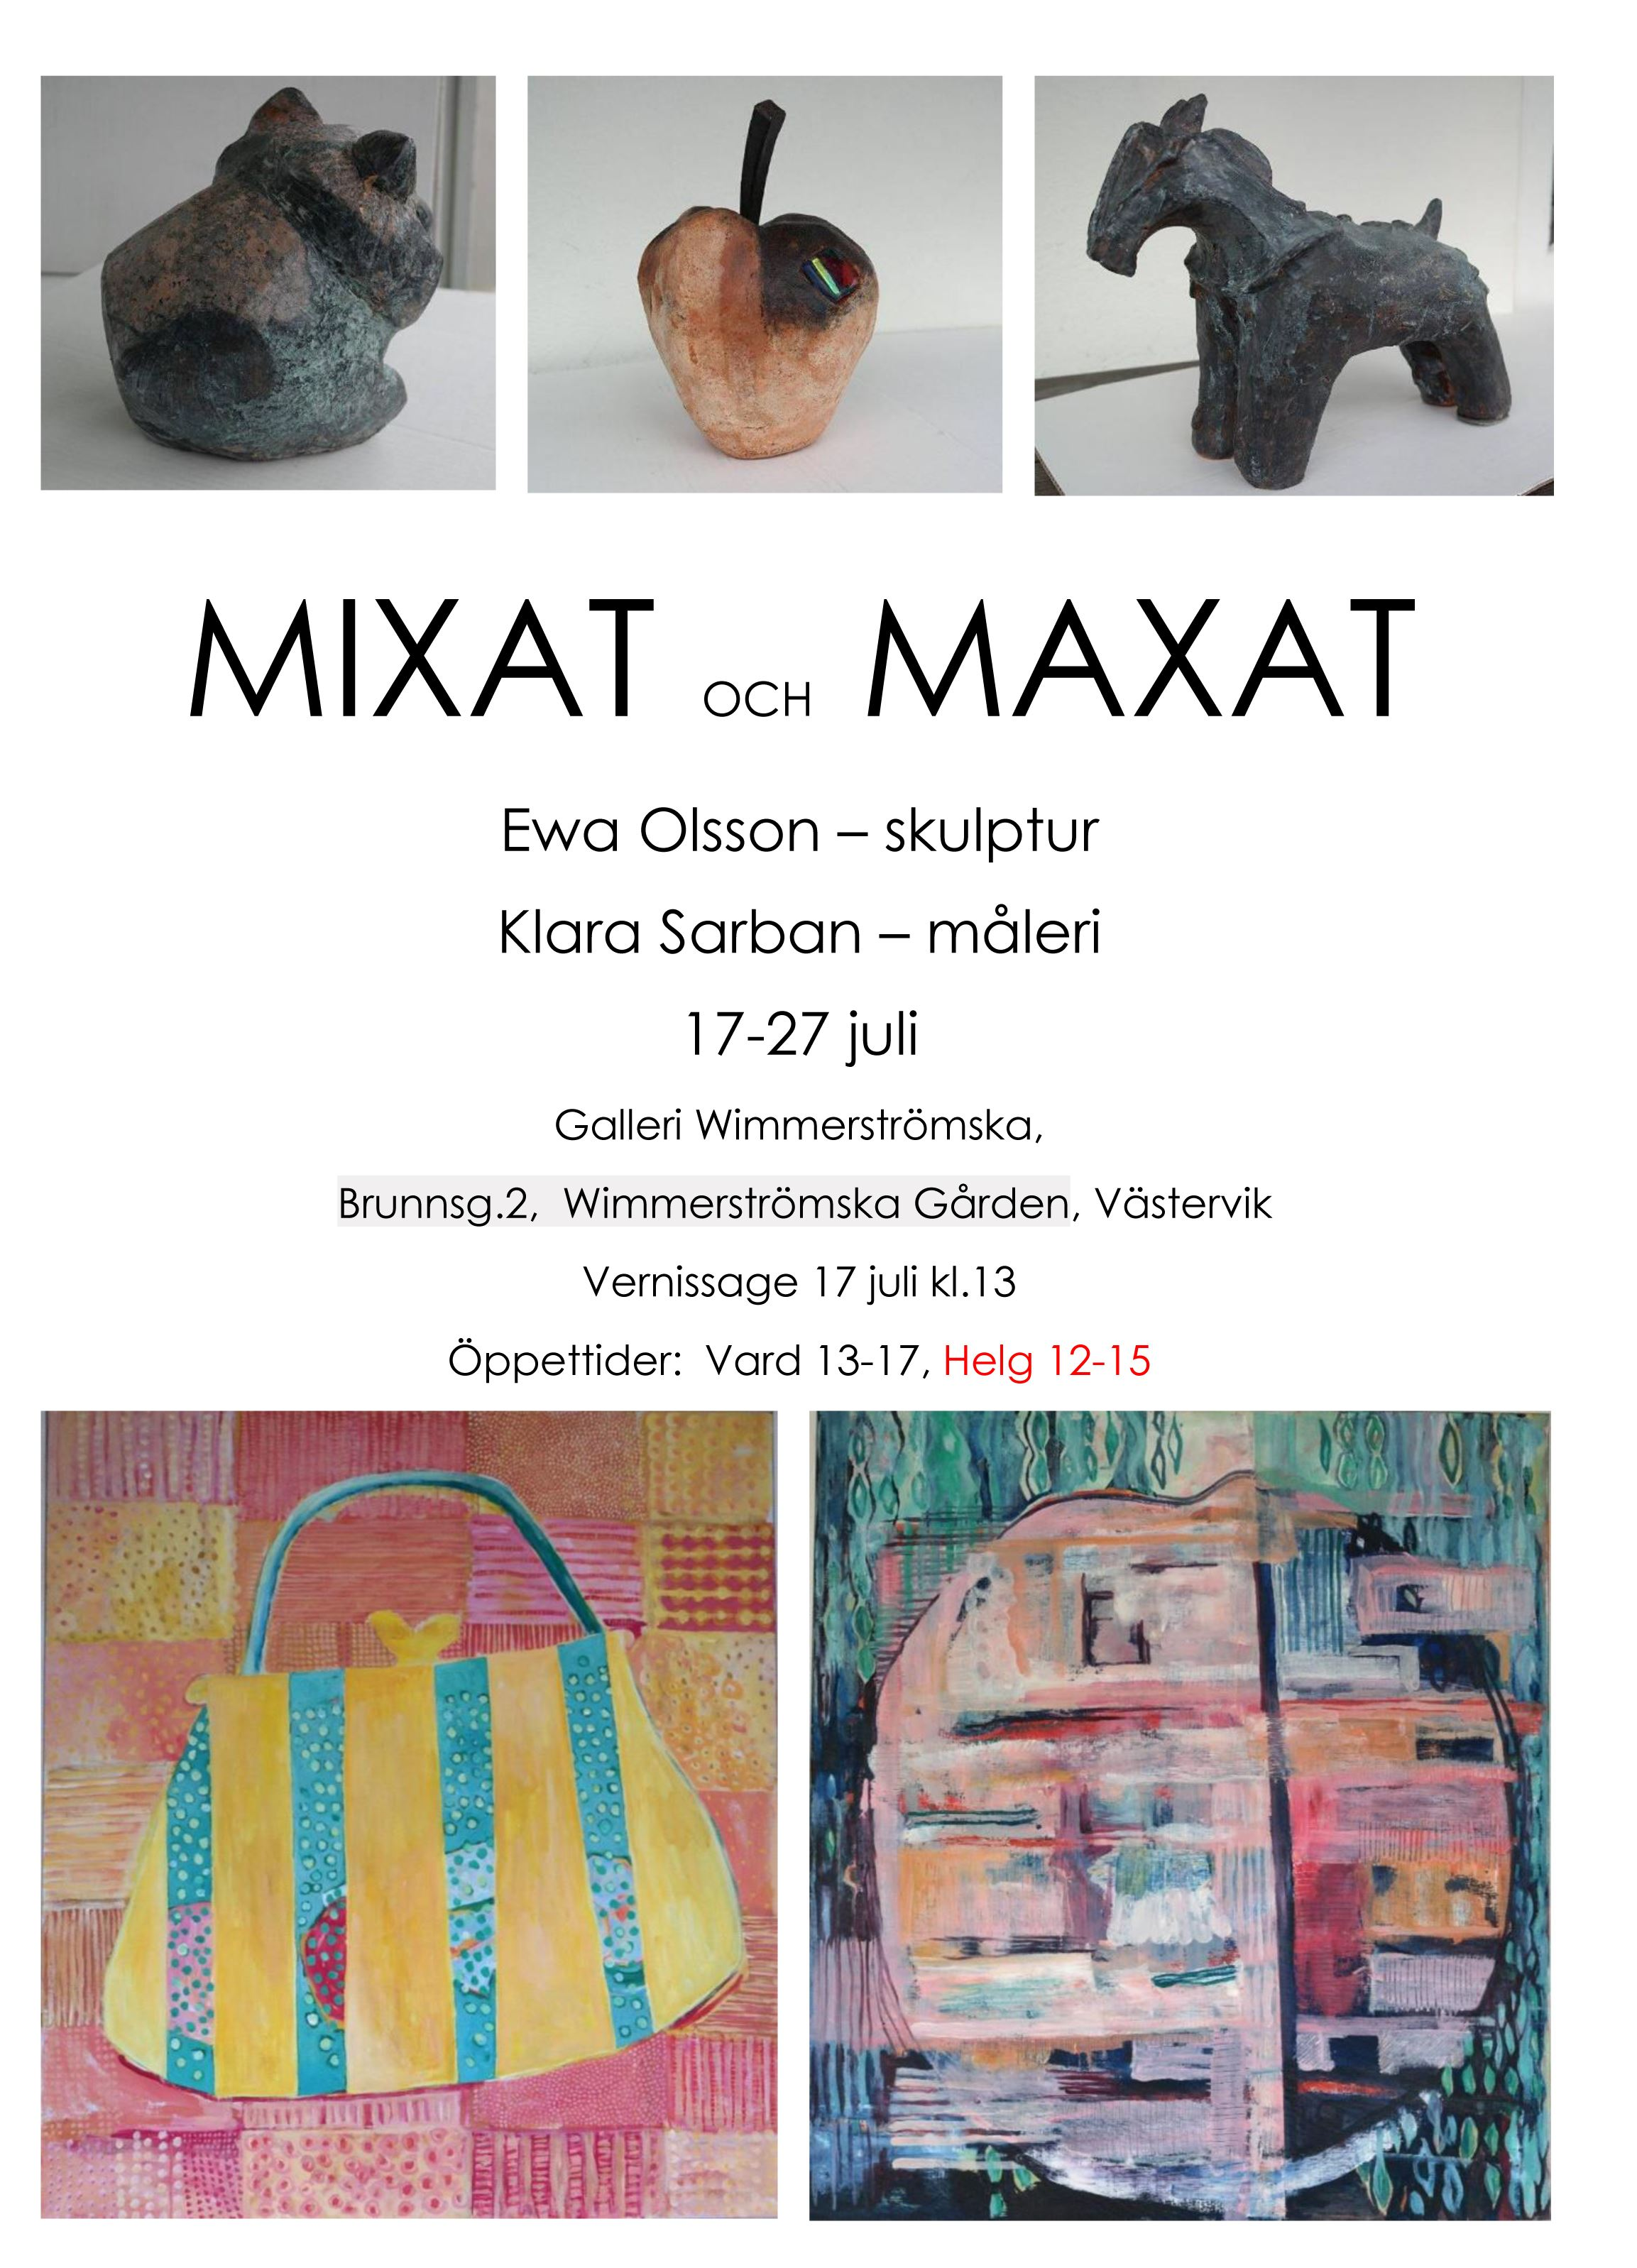 Art Exhibition at Gallery Wimmerström: Mixat och Maxat